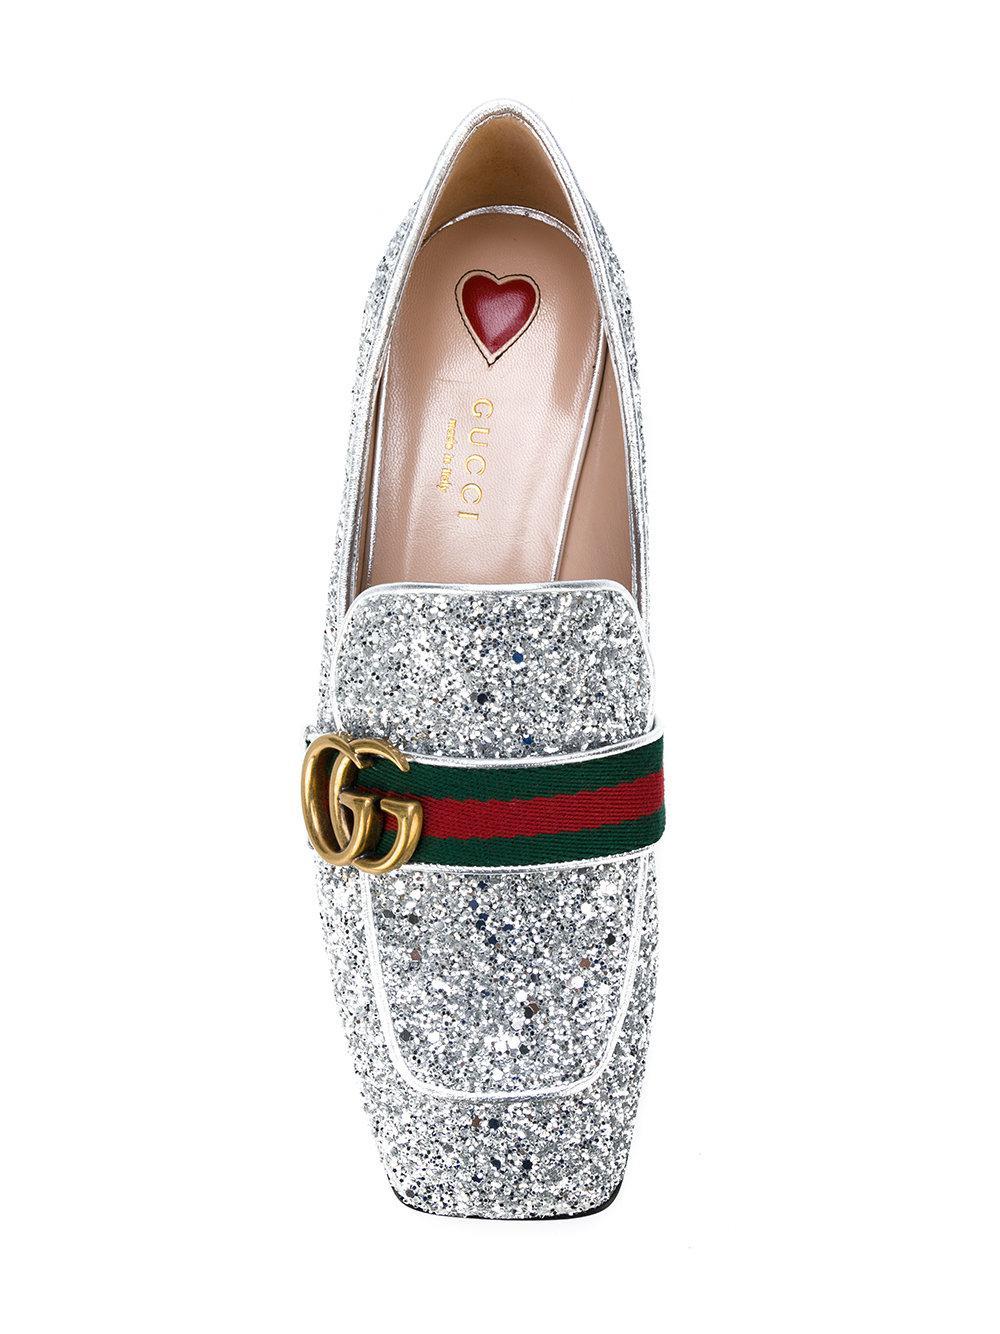 GG Web glitter loafers - Metallic Gucci ba6hpcrpid